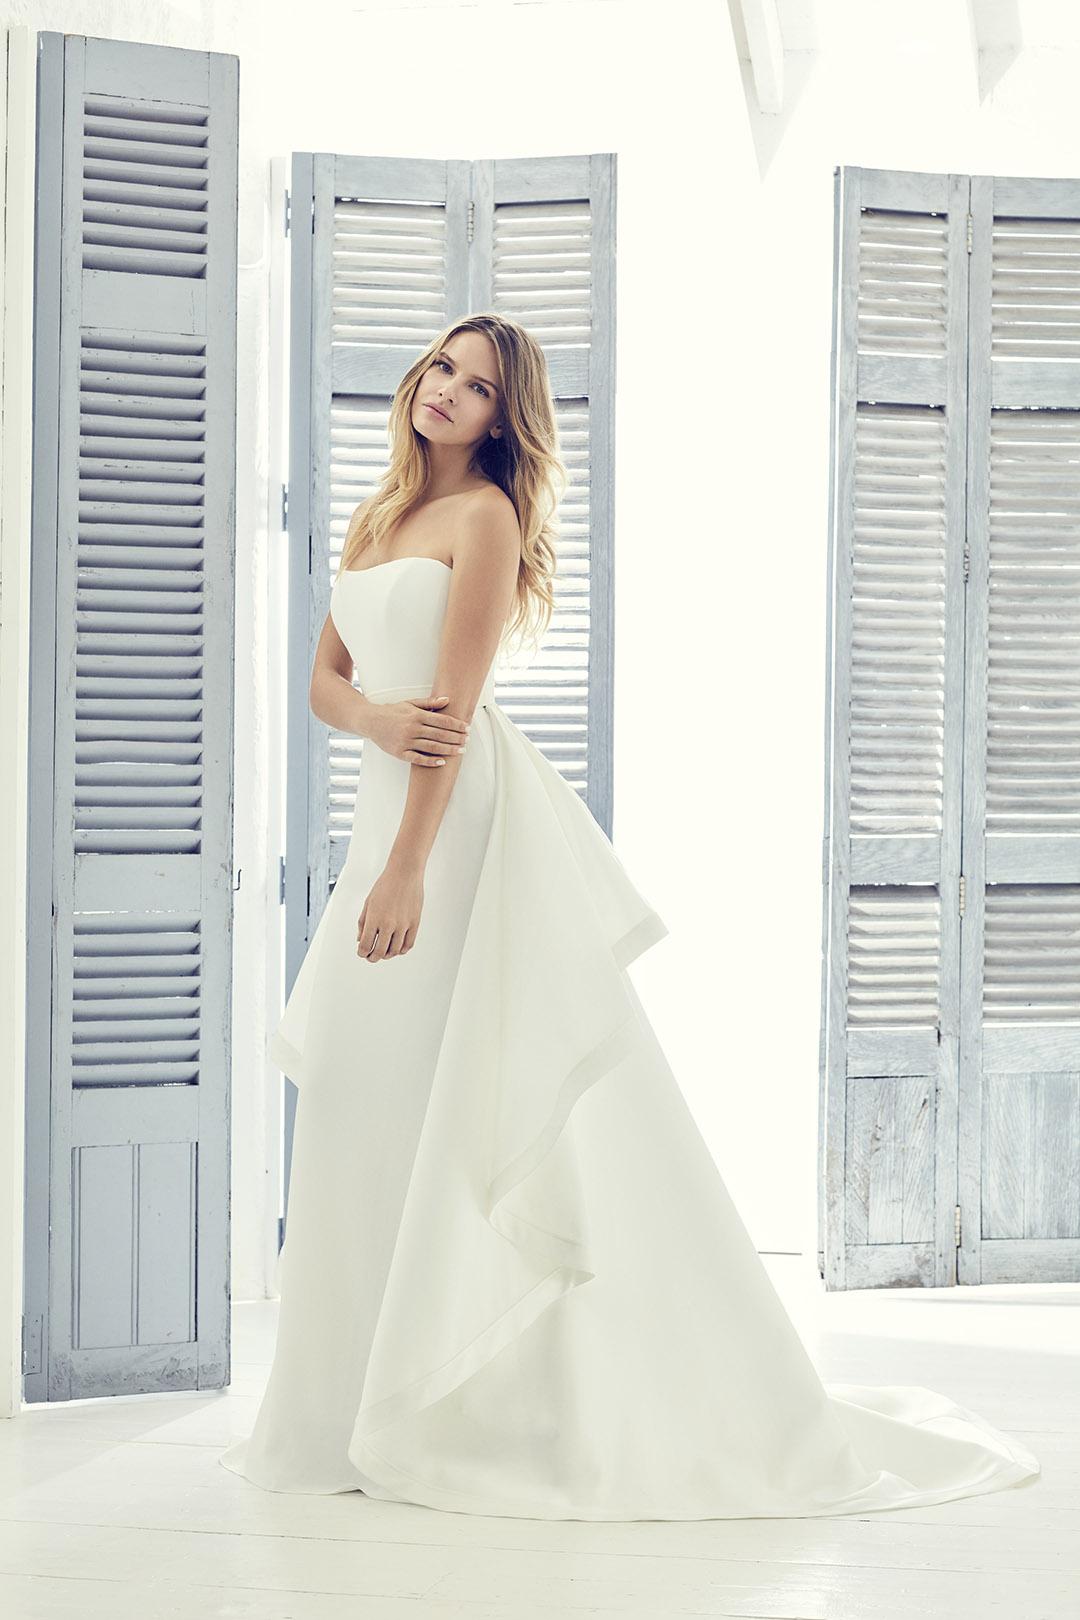 mira1-wedding-dresses-uk-suzanne-neville-collection-hd-2019